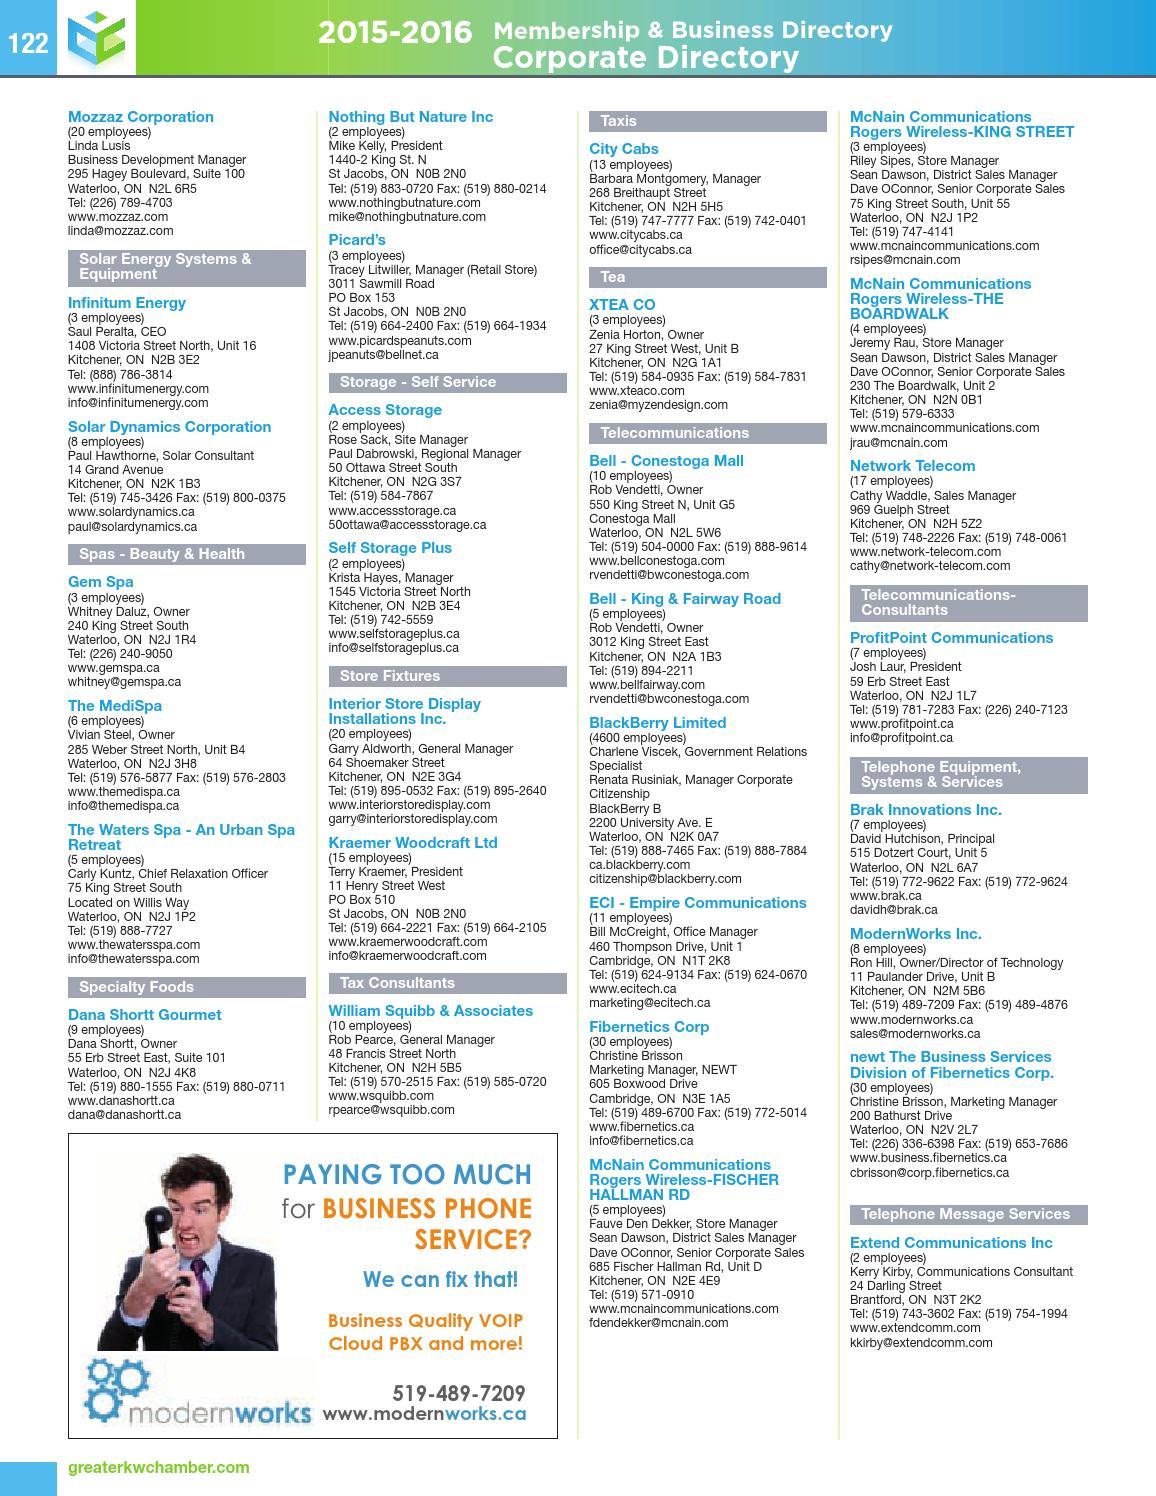 2015-16 Membership & Business Directory by Natalie Hemmerich